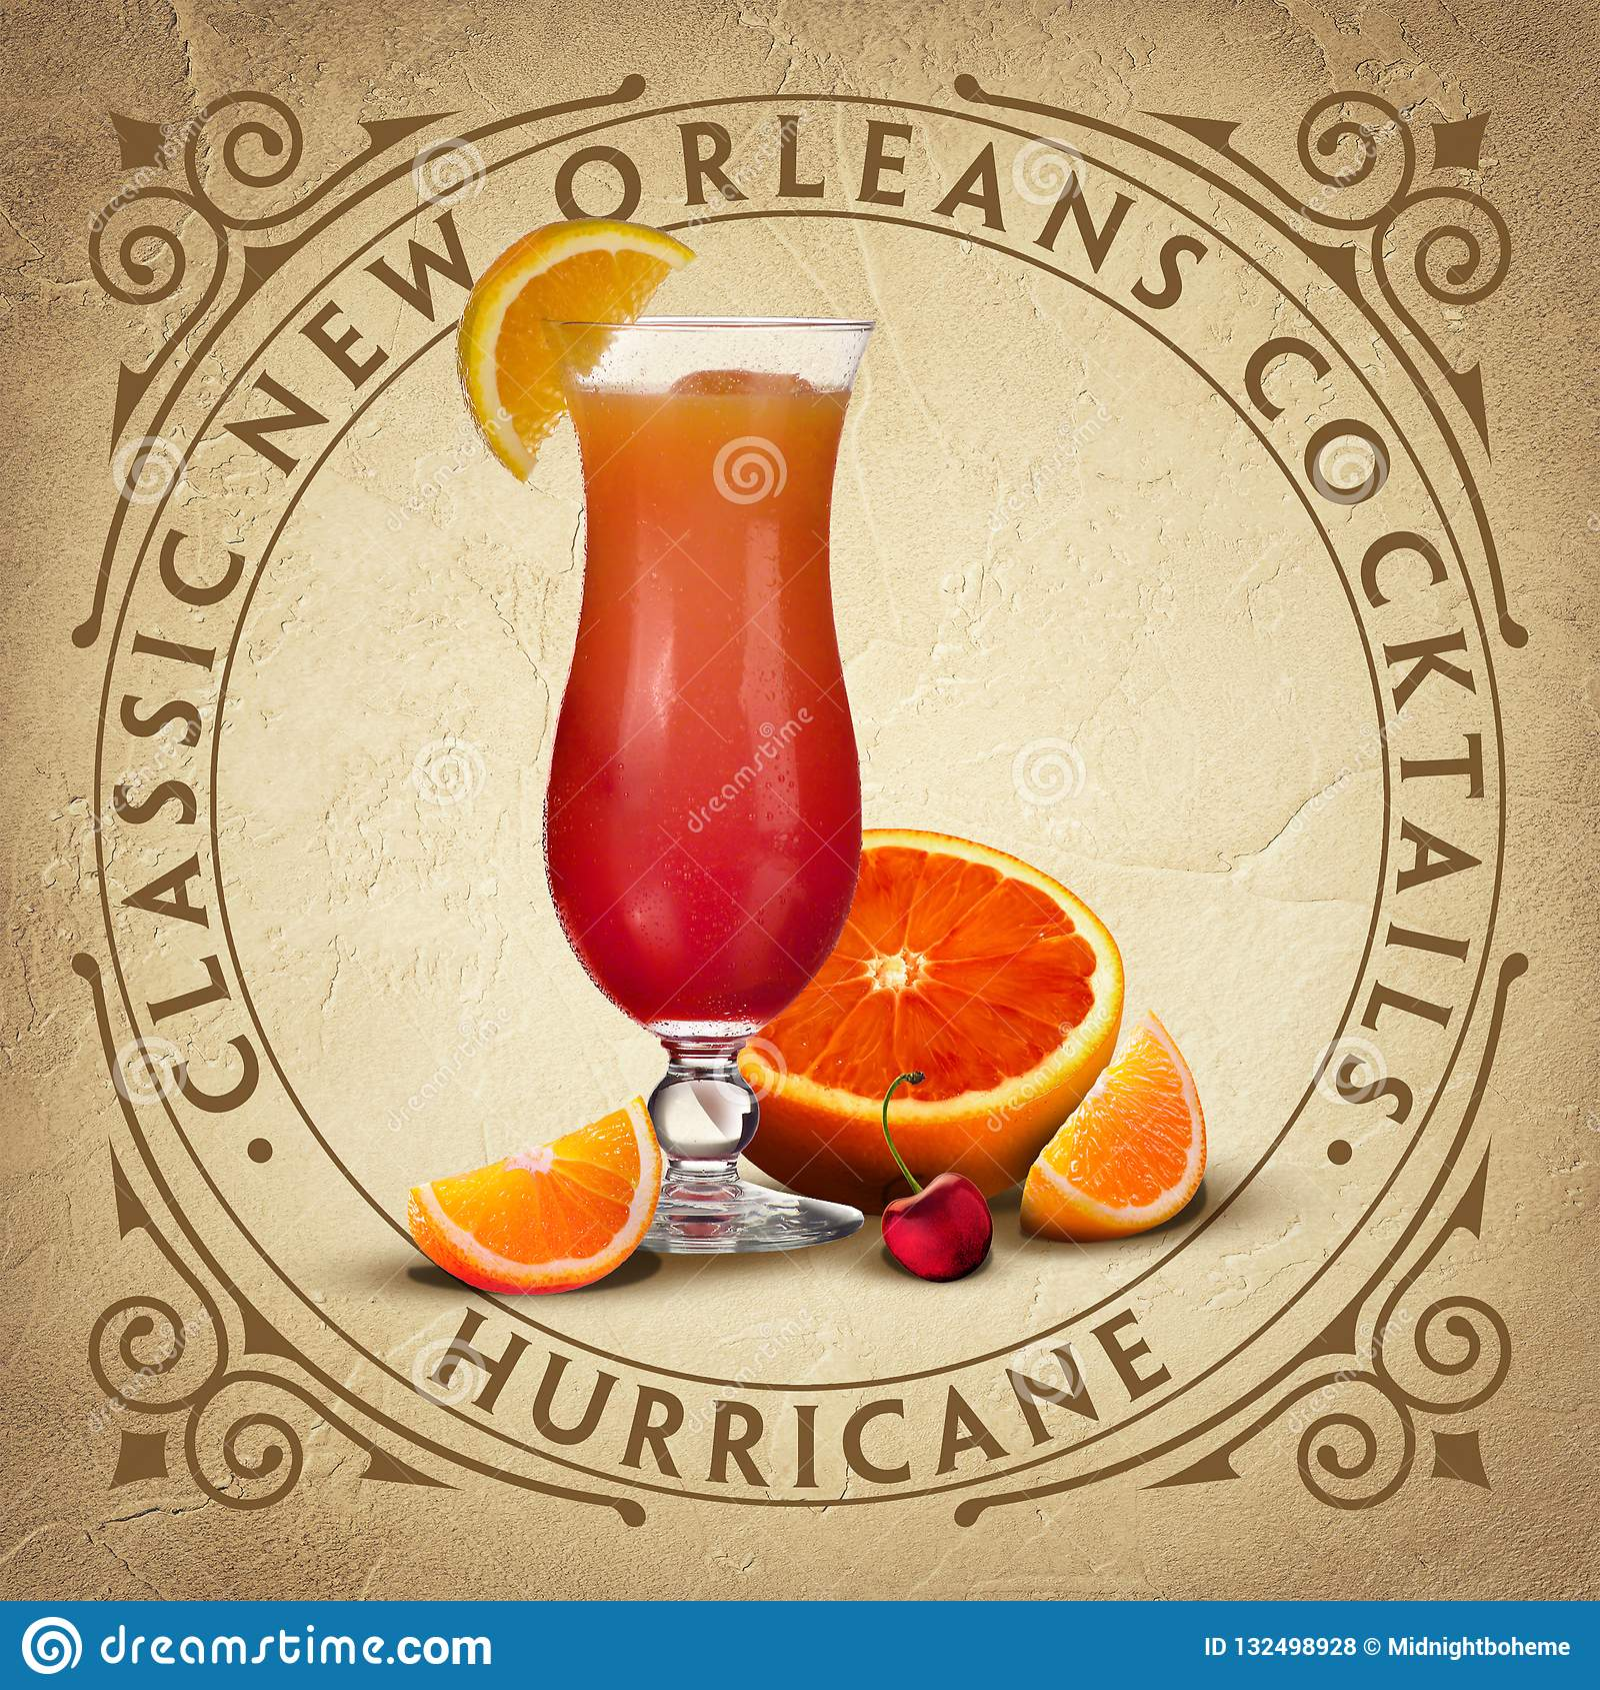 Cócteles clásicos icónicos históricos de New Orleans